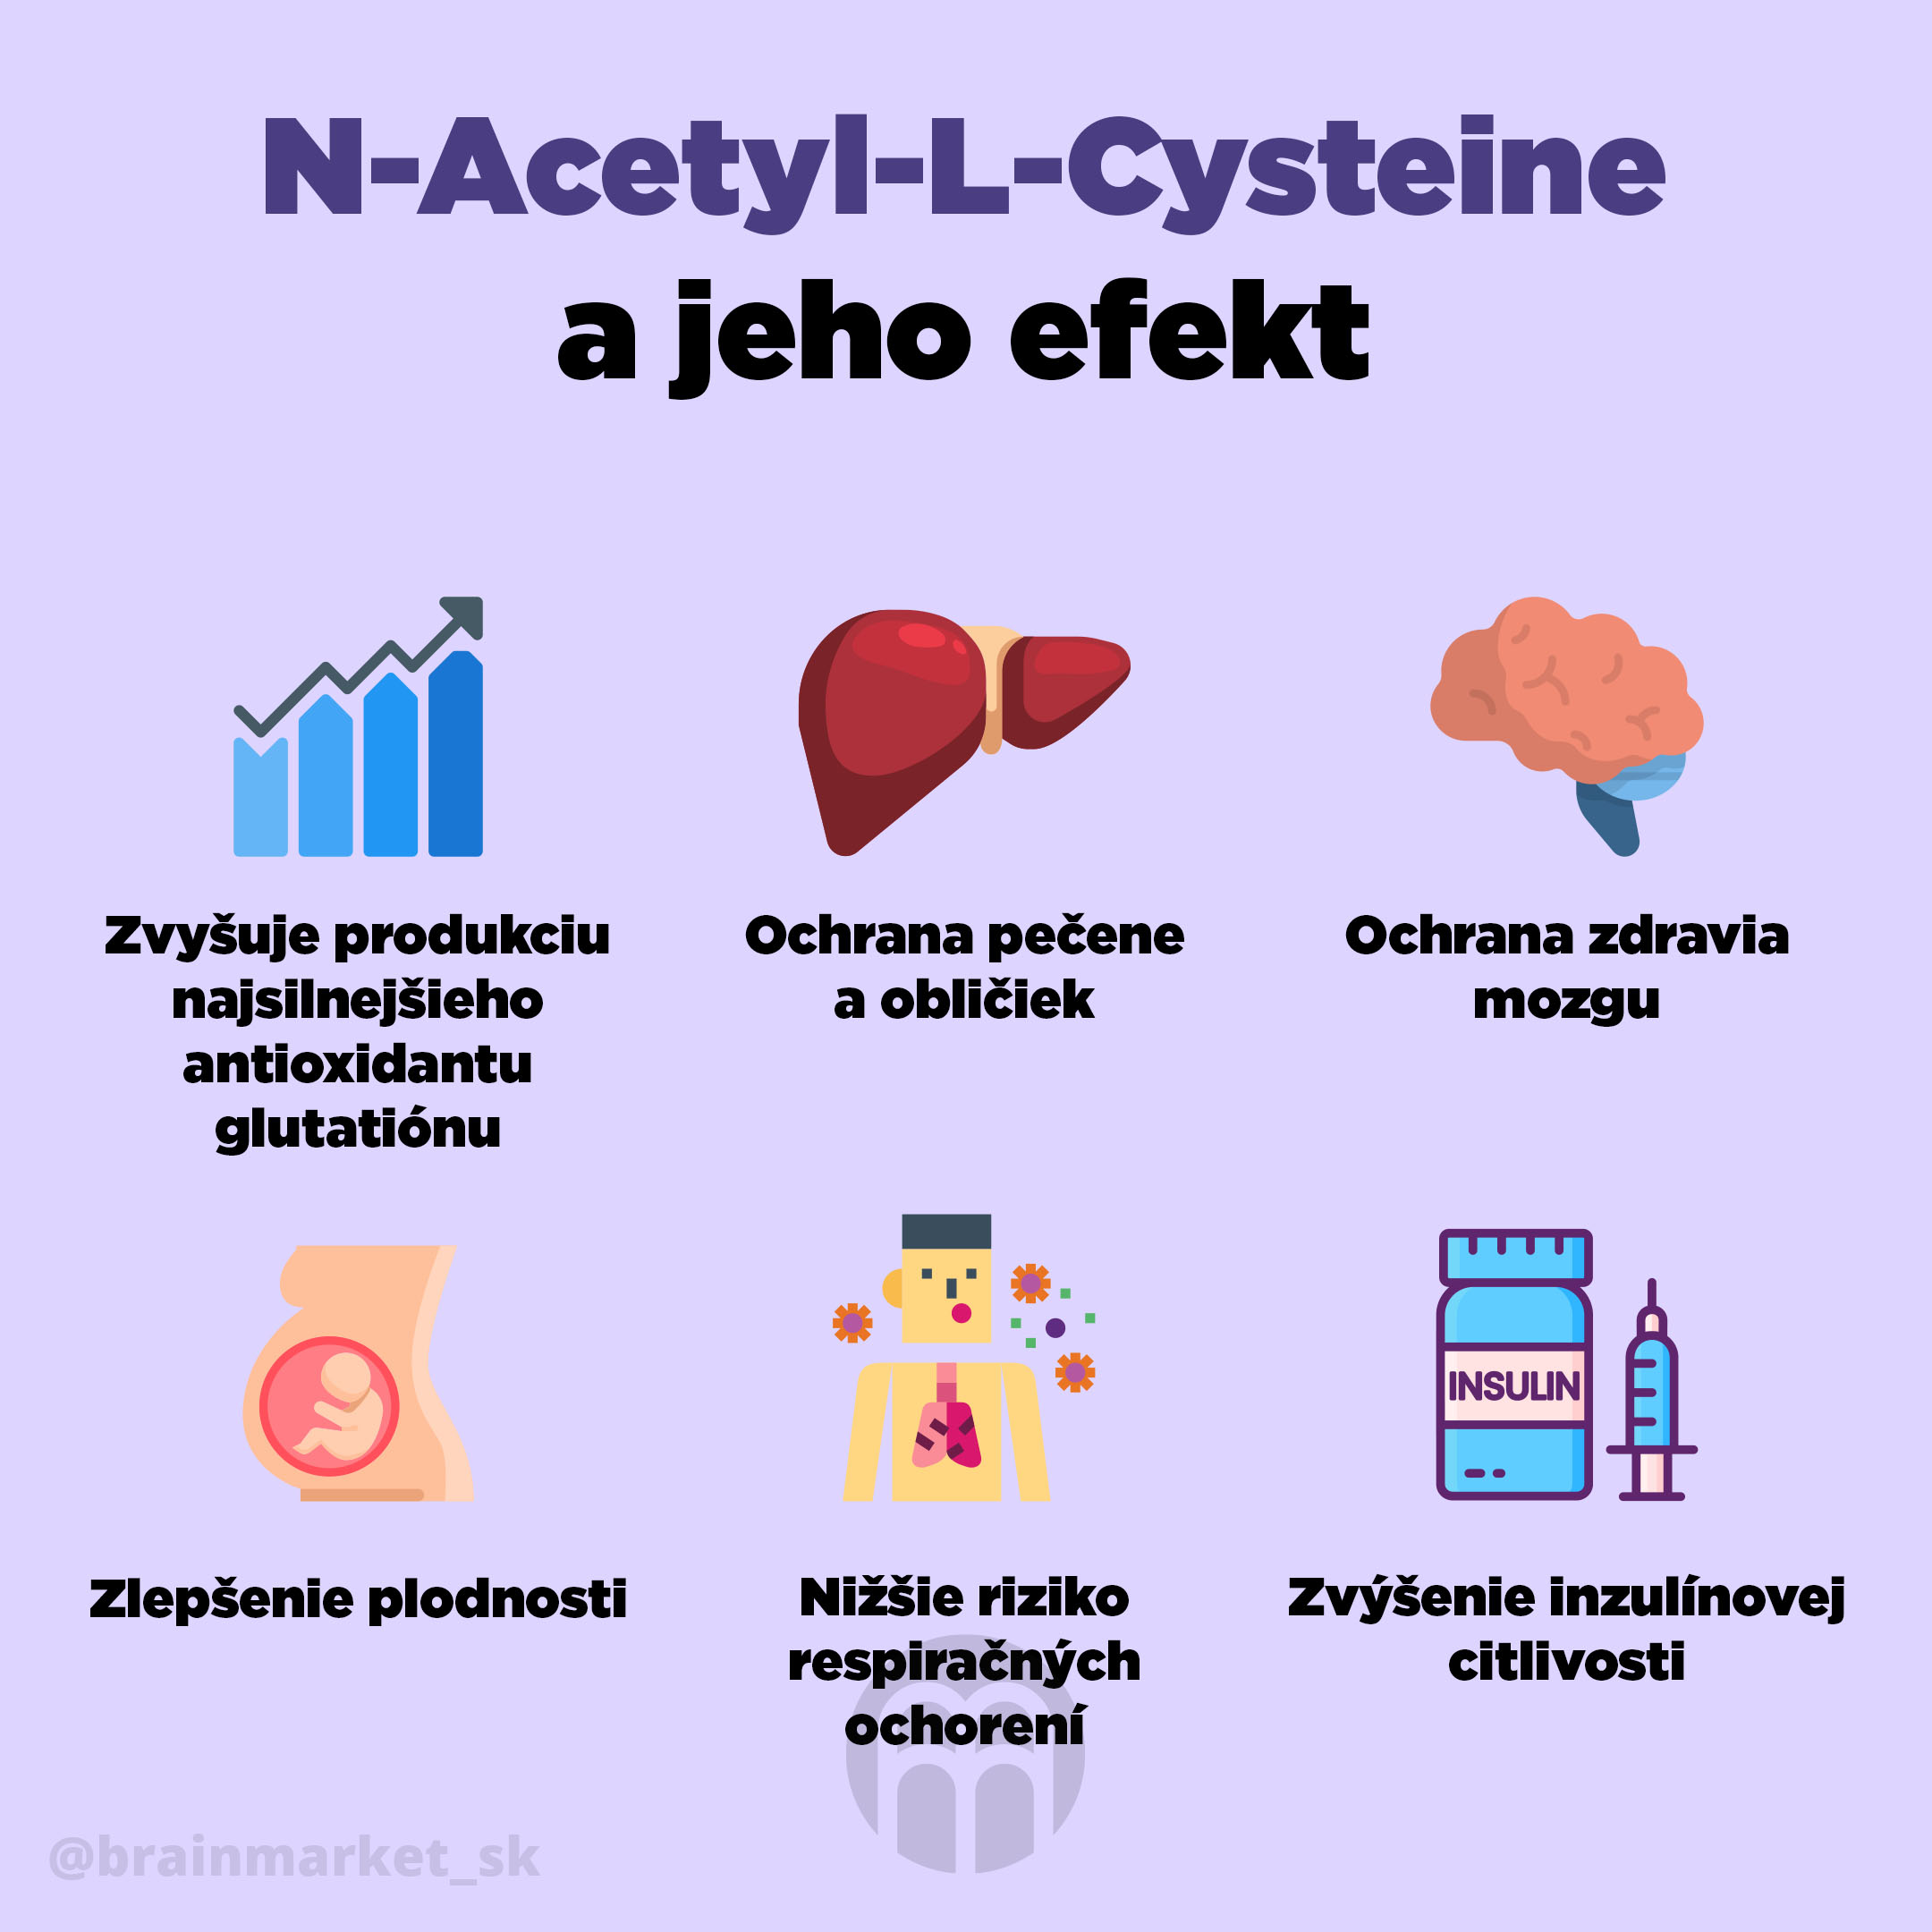 N-Acetyl-L-Cysteine (NAC) - superman medzi antioxidantmi